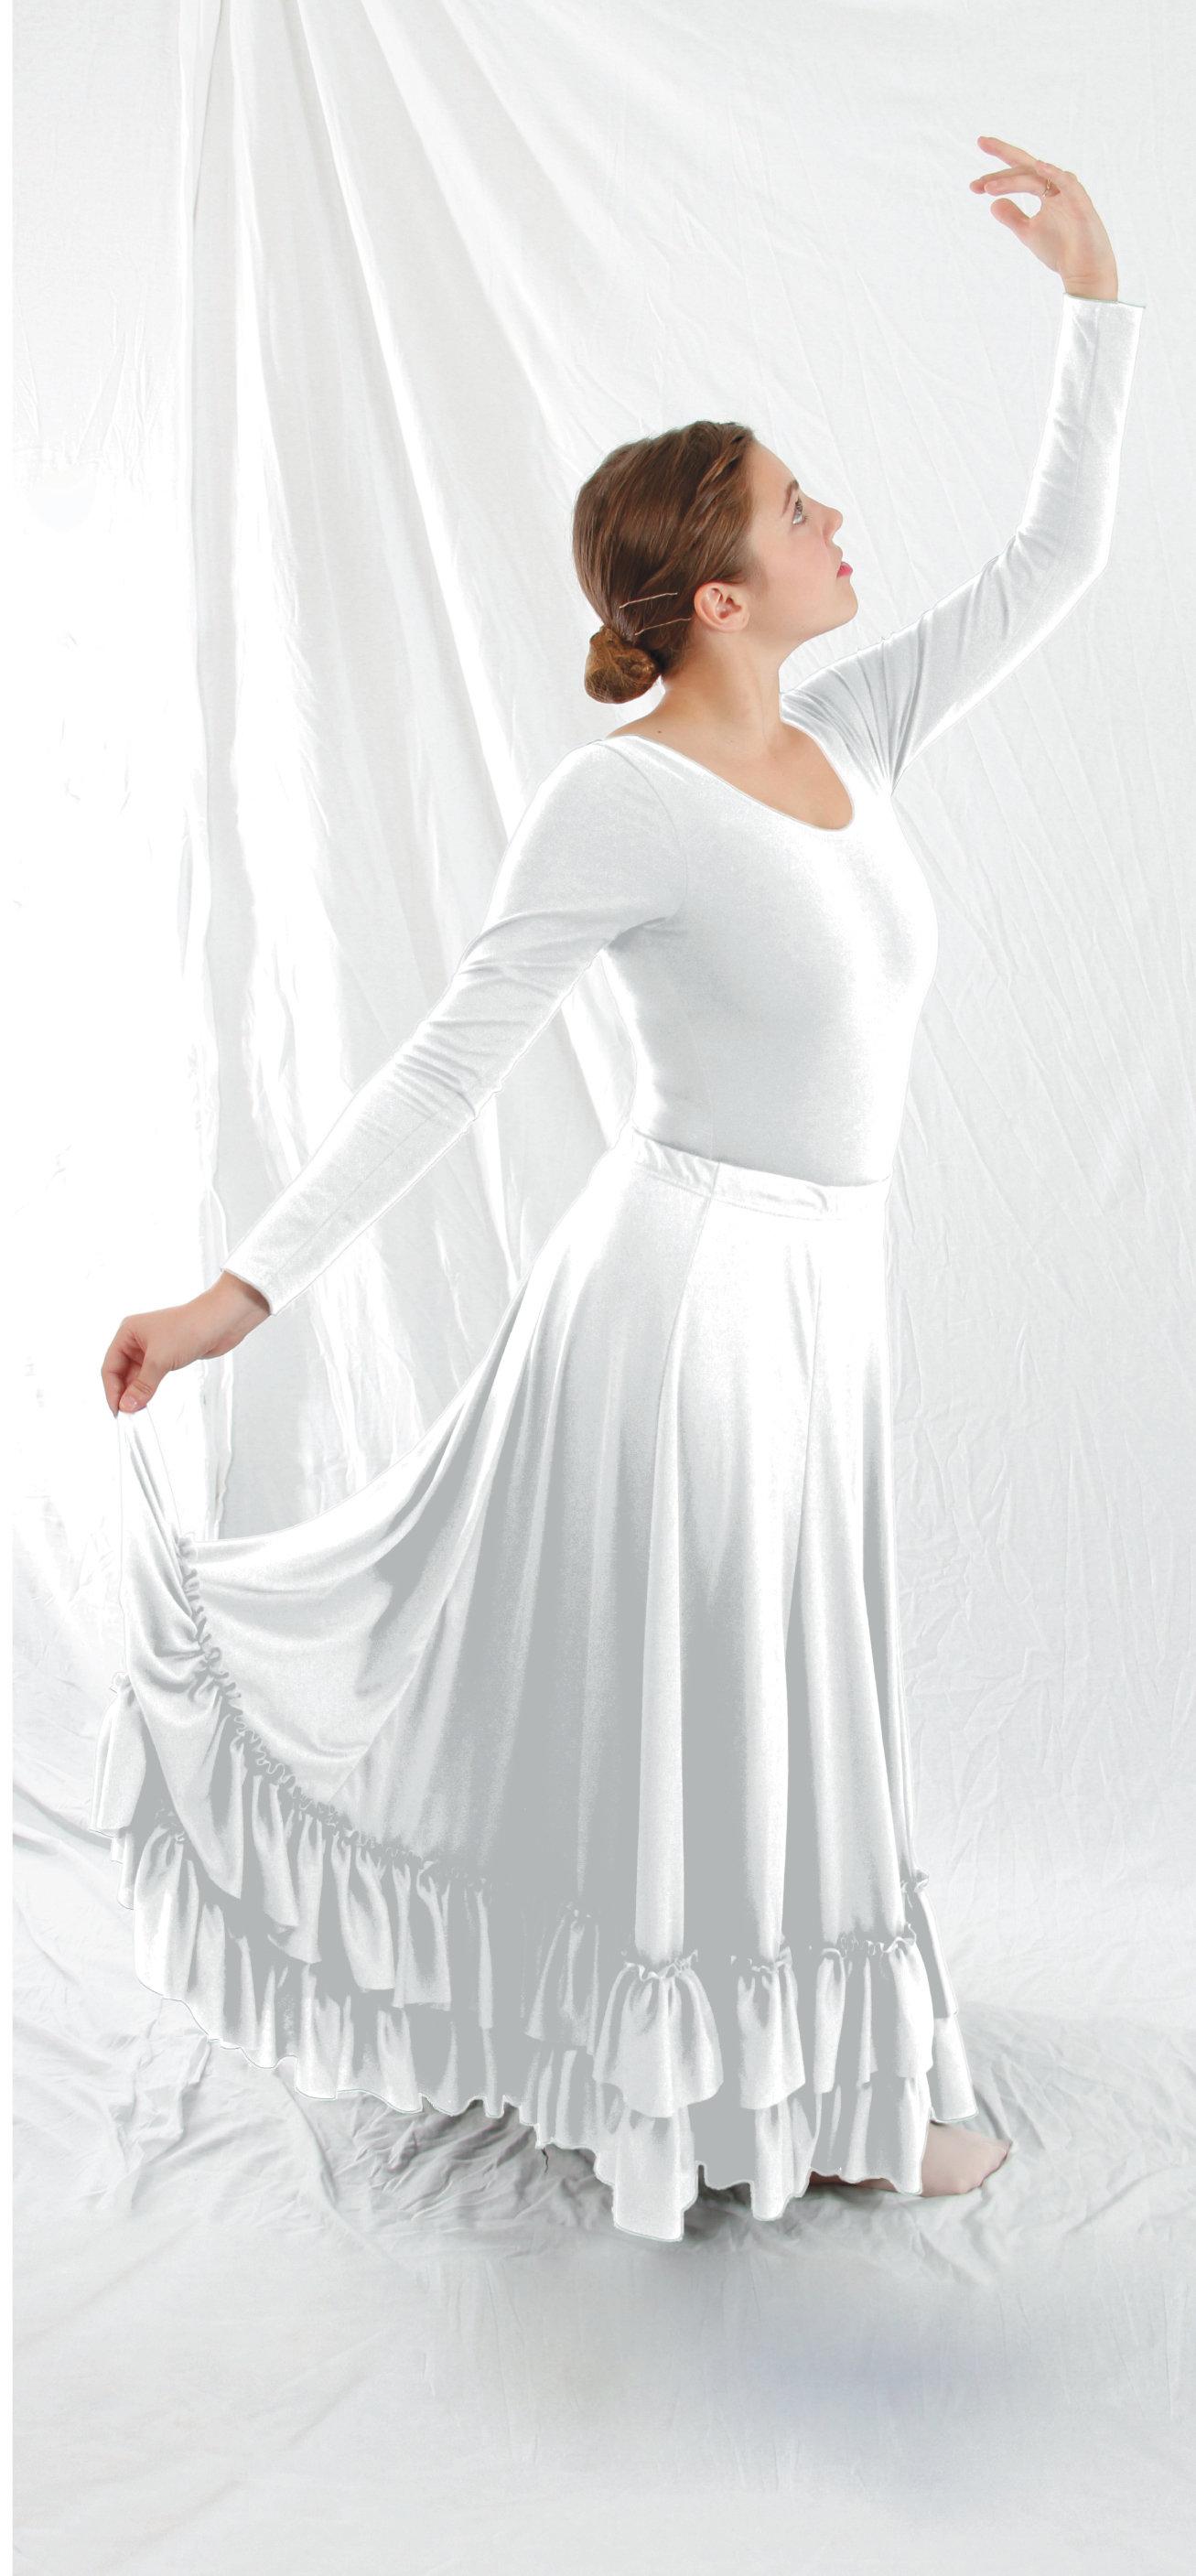 Basic Moves - Plus Size 540° Skirt Ad White ONFA 630089030591